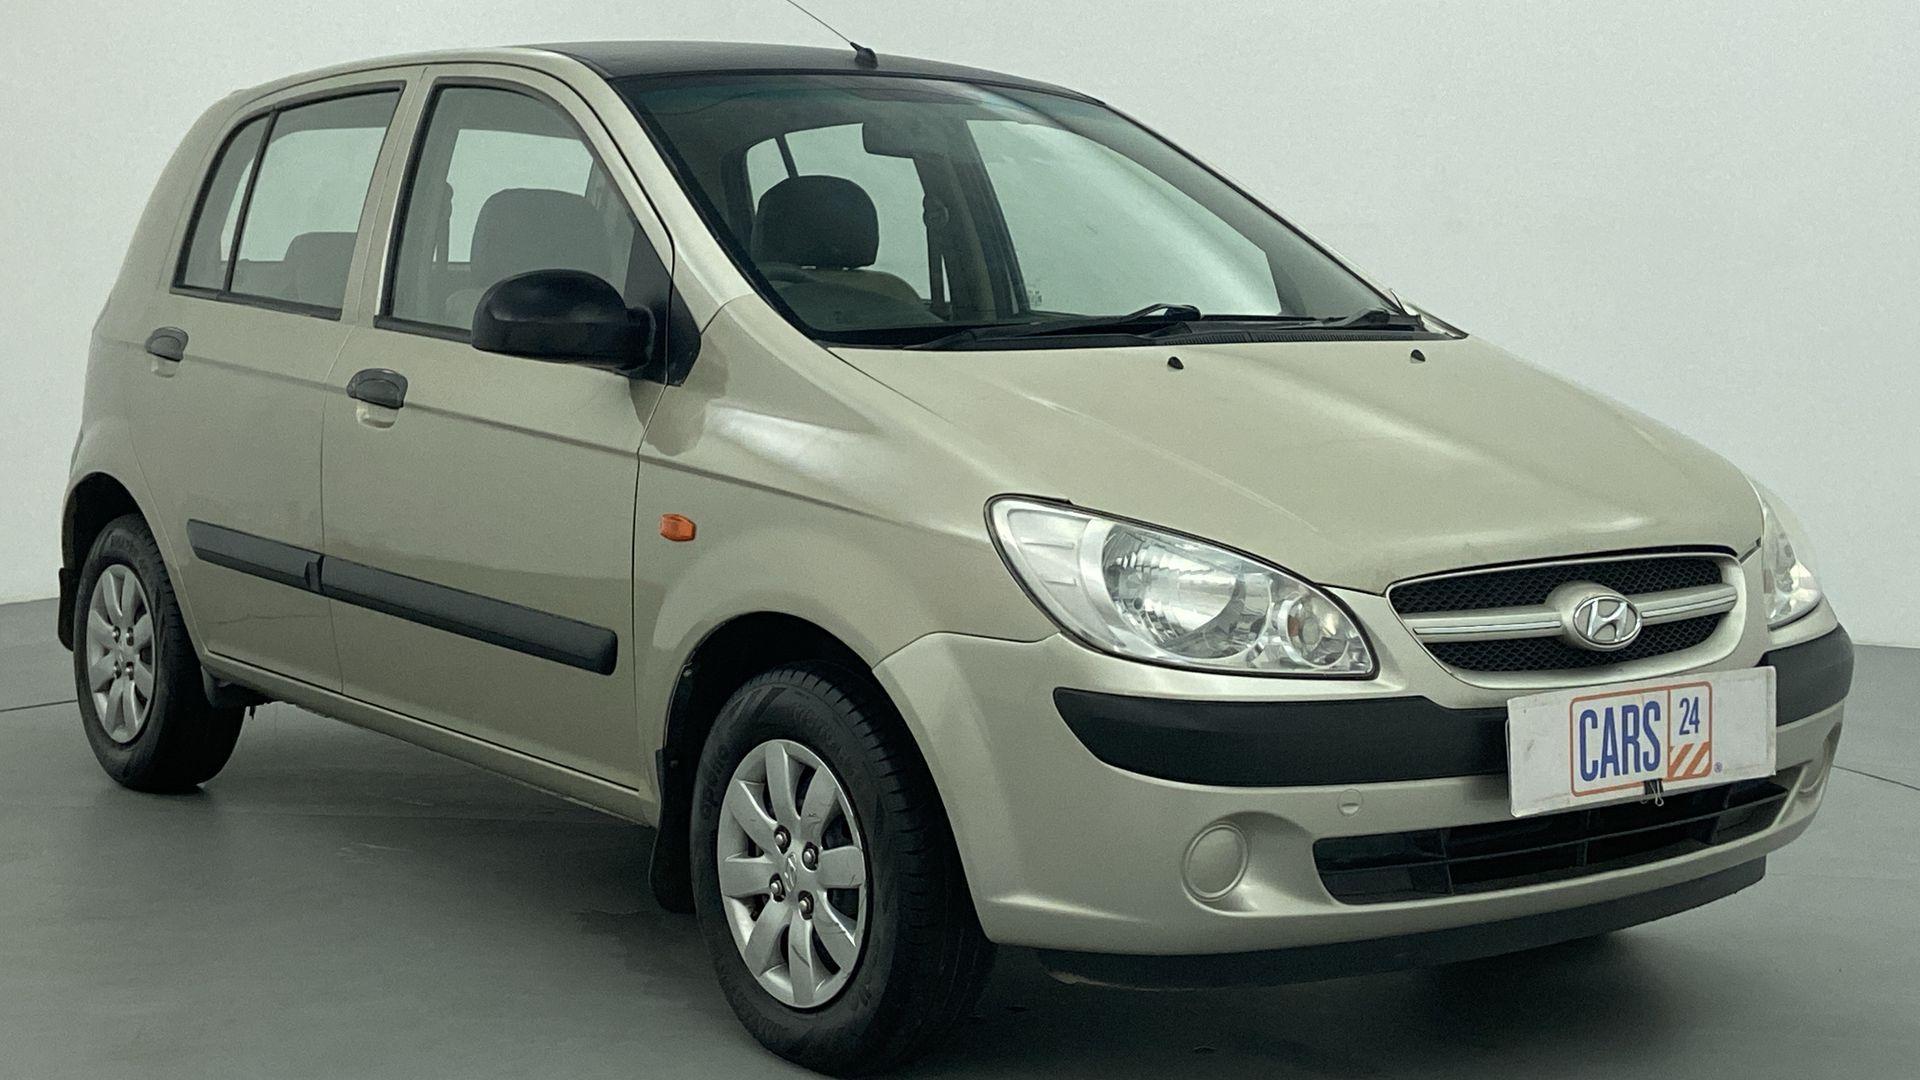 2009 Hyundai Getz Prime 1.1 GVS